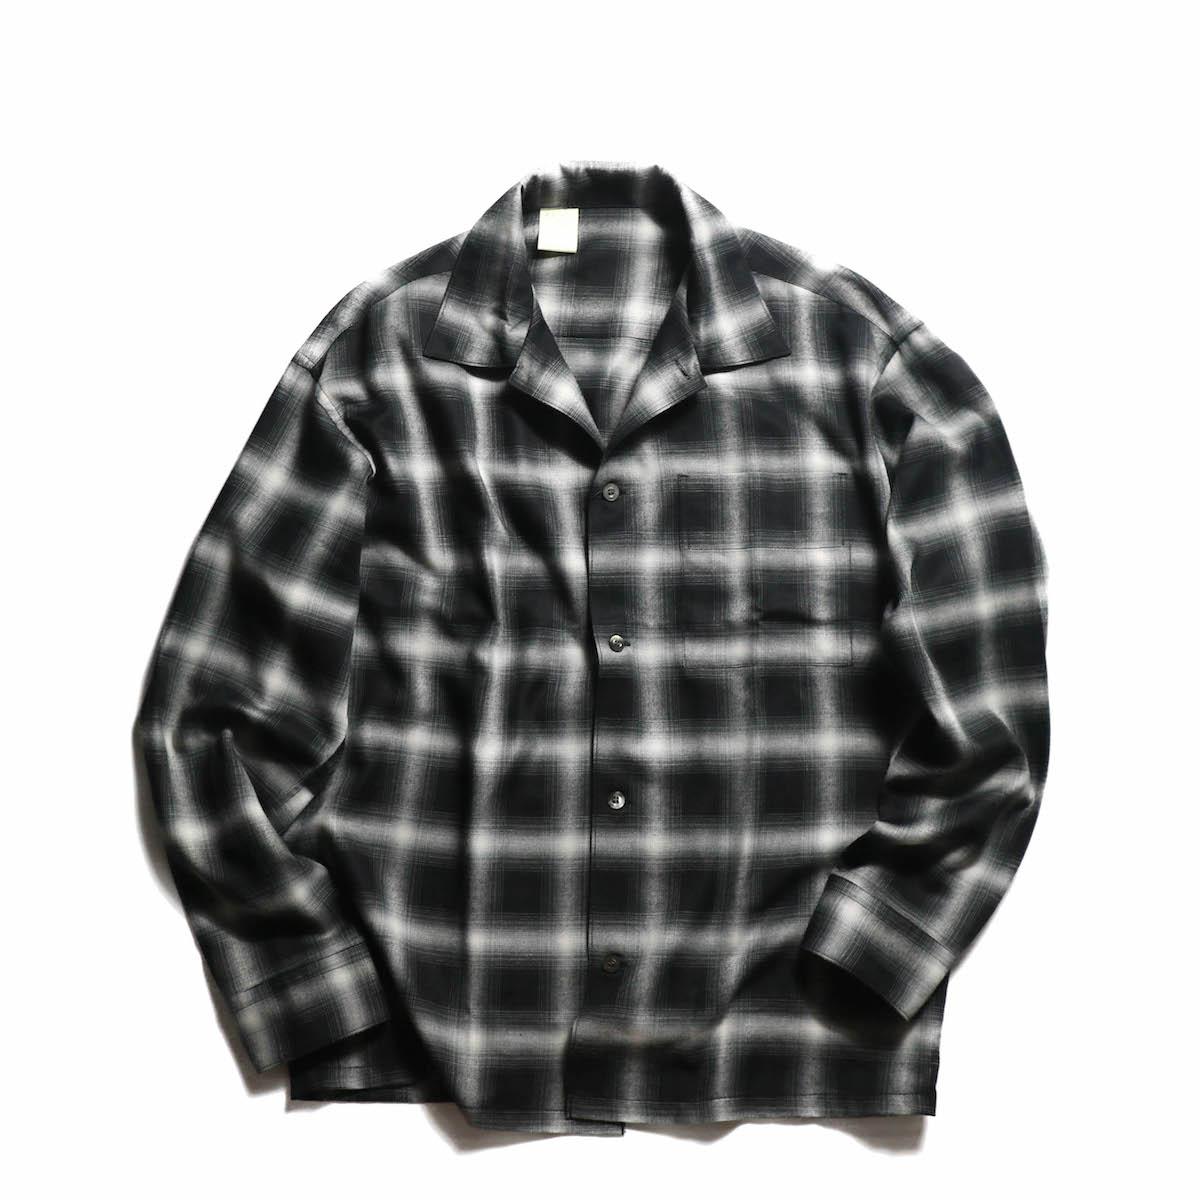 N.HOOLYWOOD / 181-SH05004 OMBRE CHECK SHIRT -BLACK CHECK